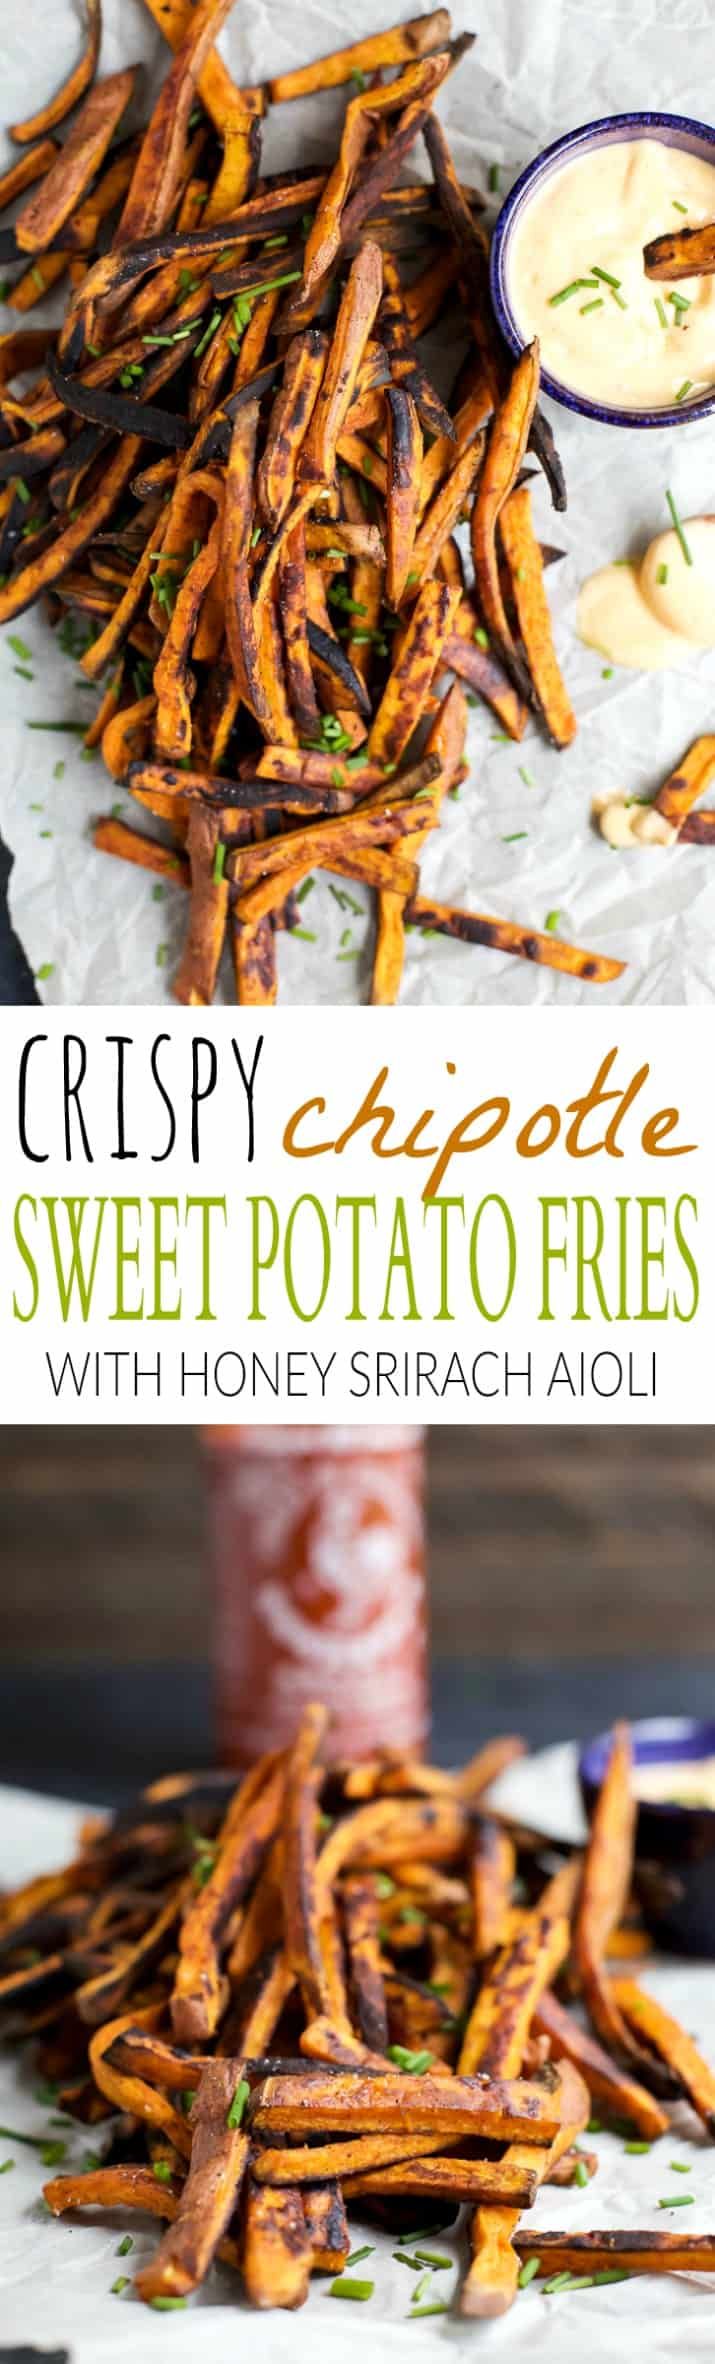 Pinterest collage for Crispy Chipotle Sweet Potato Fries with Honey Sriracha Aioli recipe